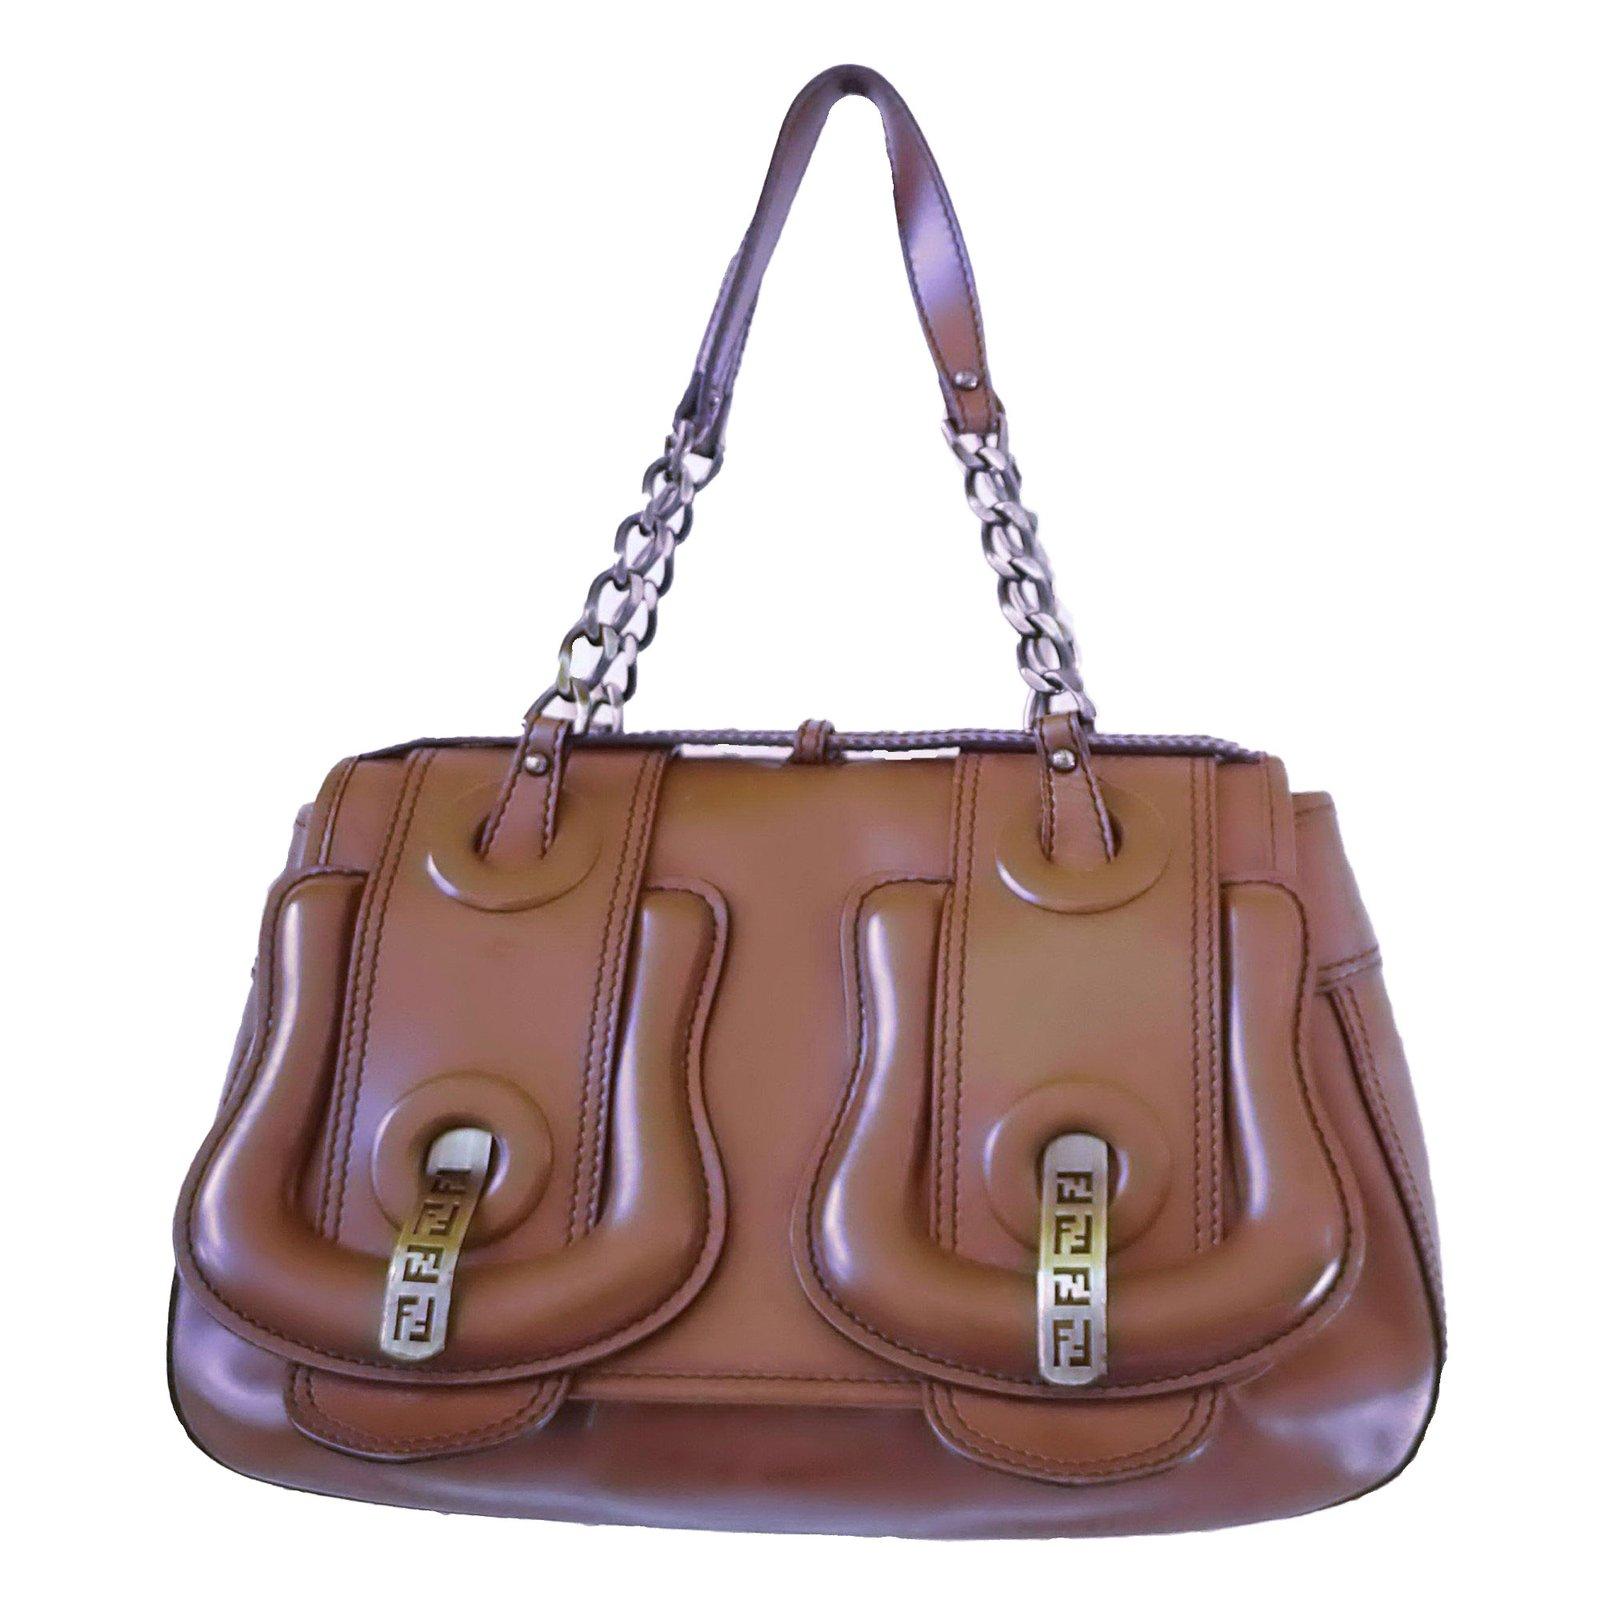 Fendi B Bag Handbags Leather Brown ref.58771 - Joli Closet 058ae8c057a6b